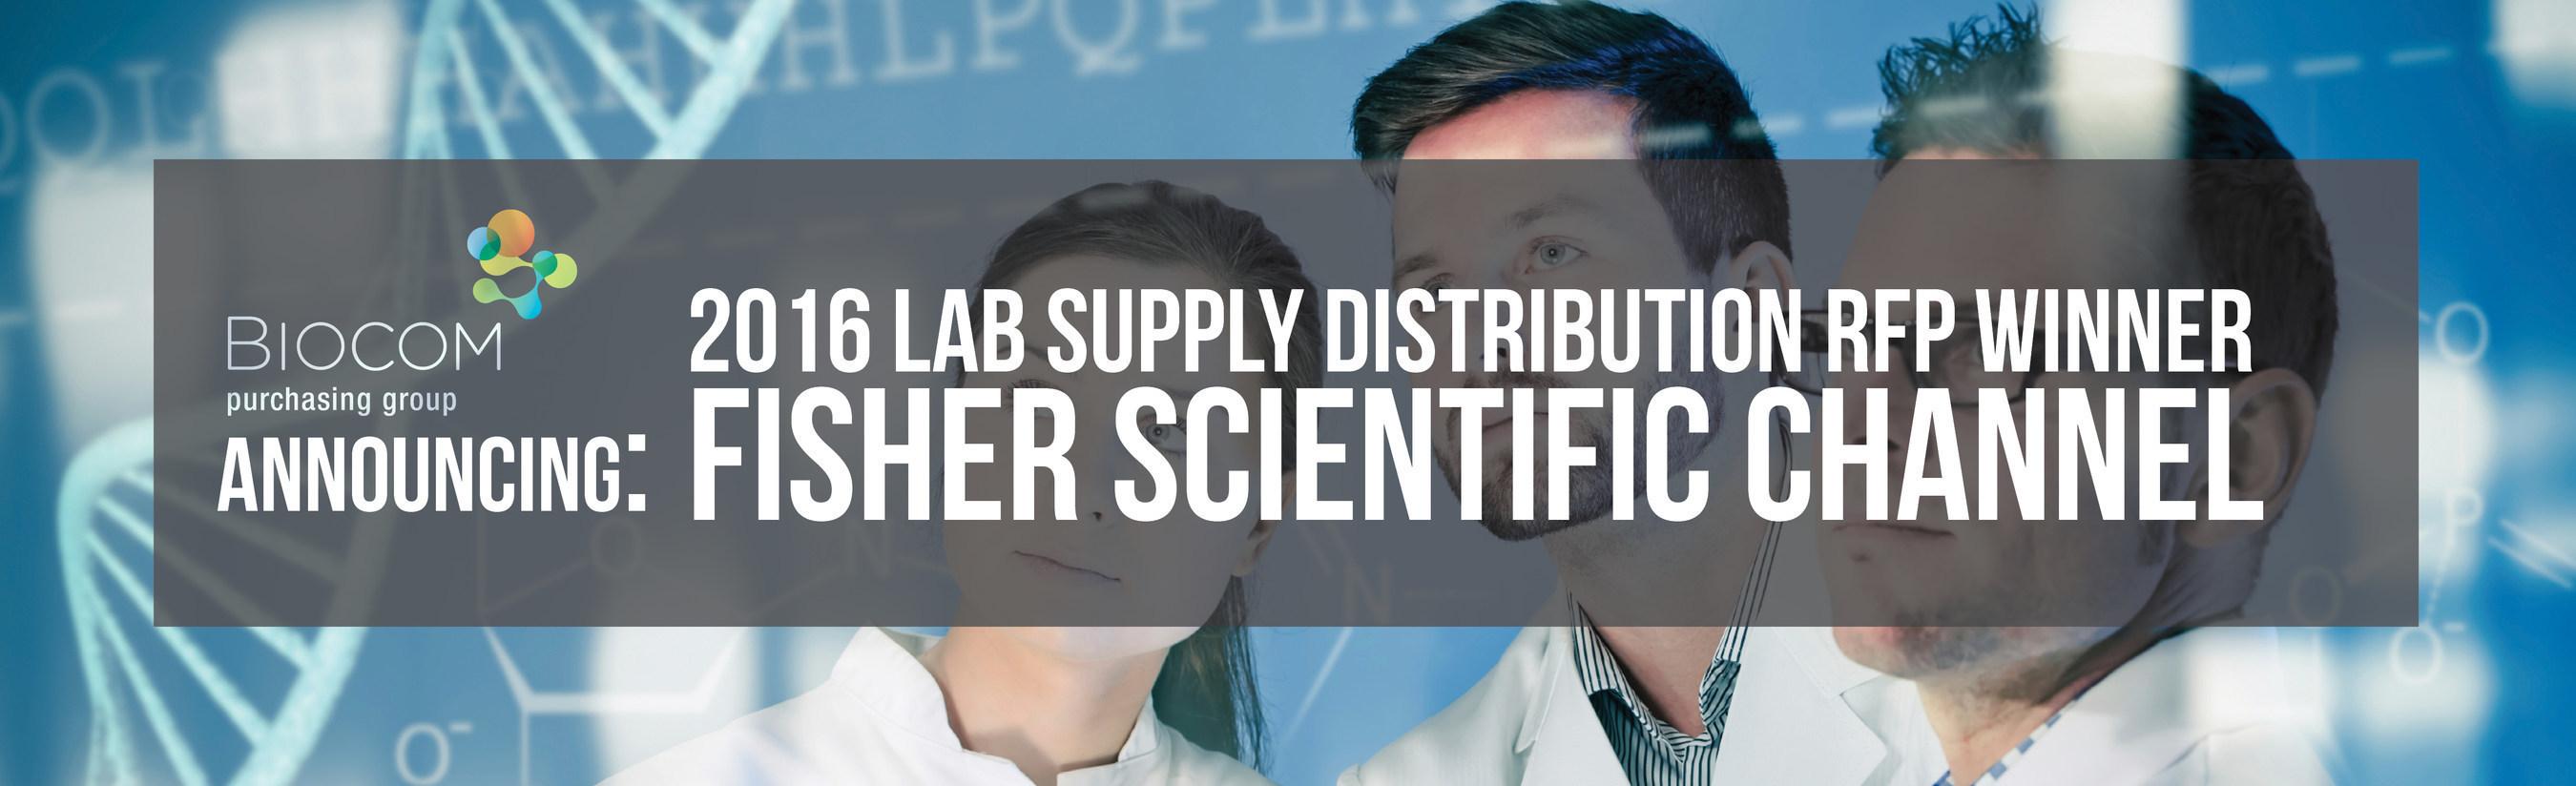 Biocom Purchasing Group Announces 2016 Lab Supply Distribution RFP Winner - Fisher Scientific Channel